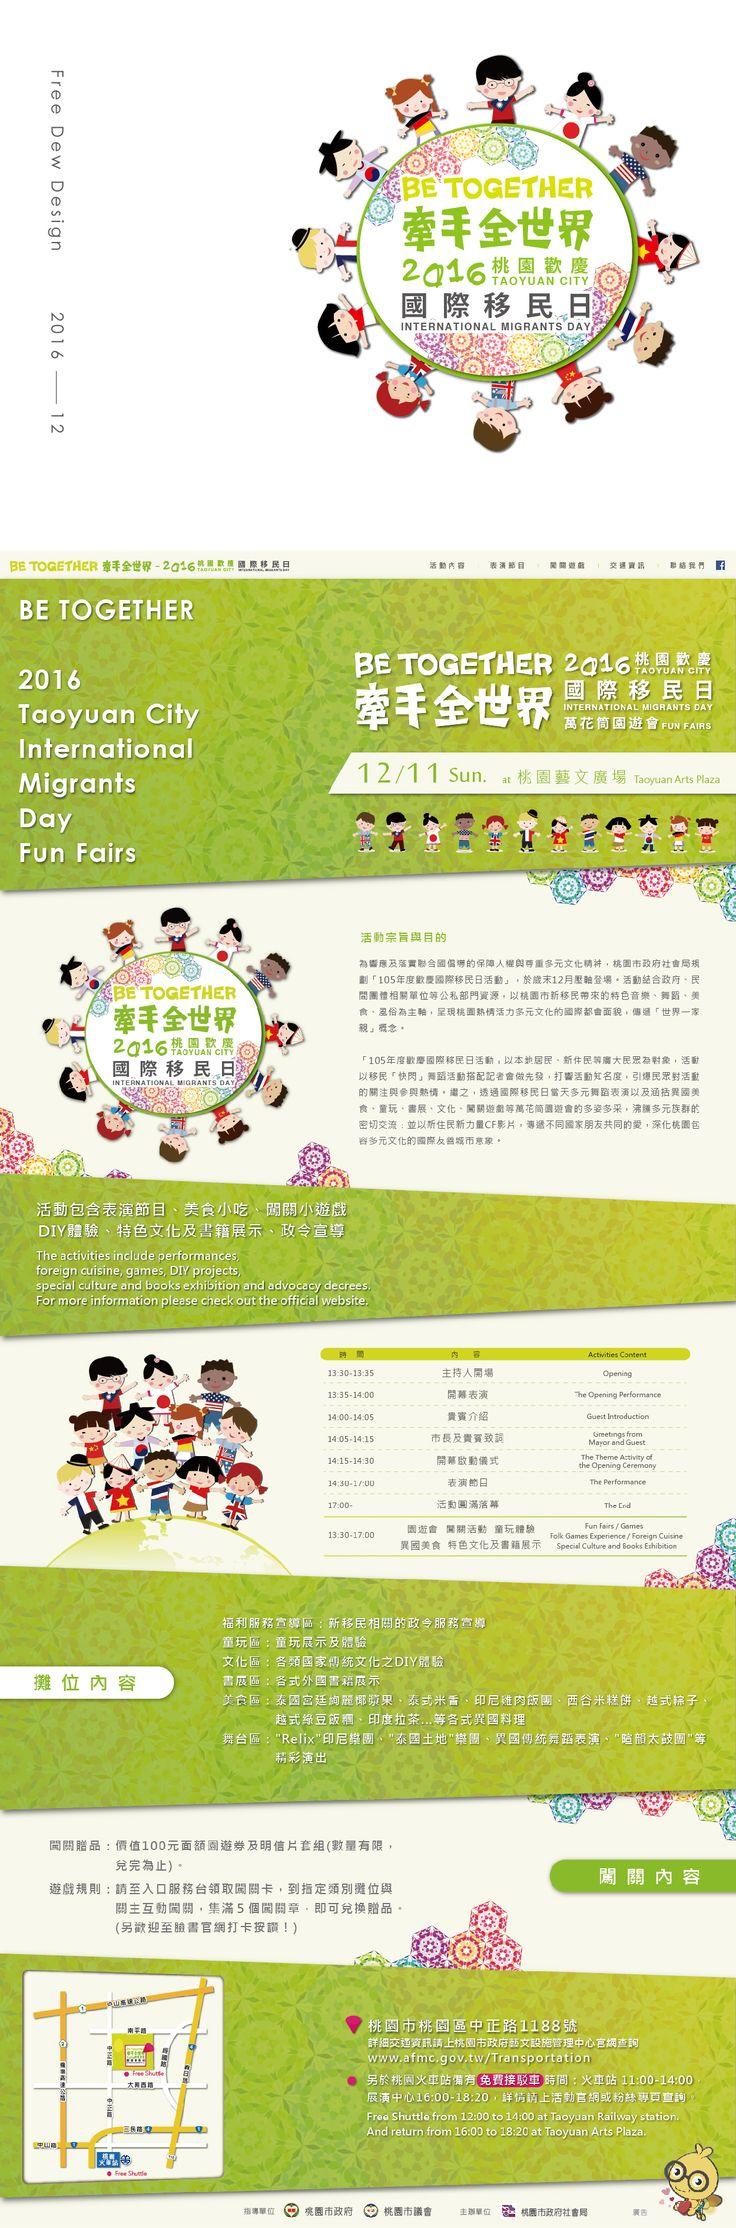 20161211 BE TOGETHER 牽手全世界‧國際移民日 / INTERNATIONAL MIGRANTS DAY